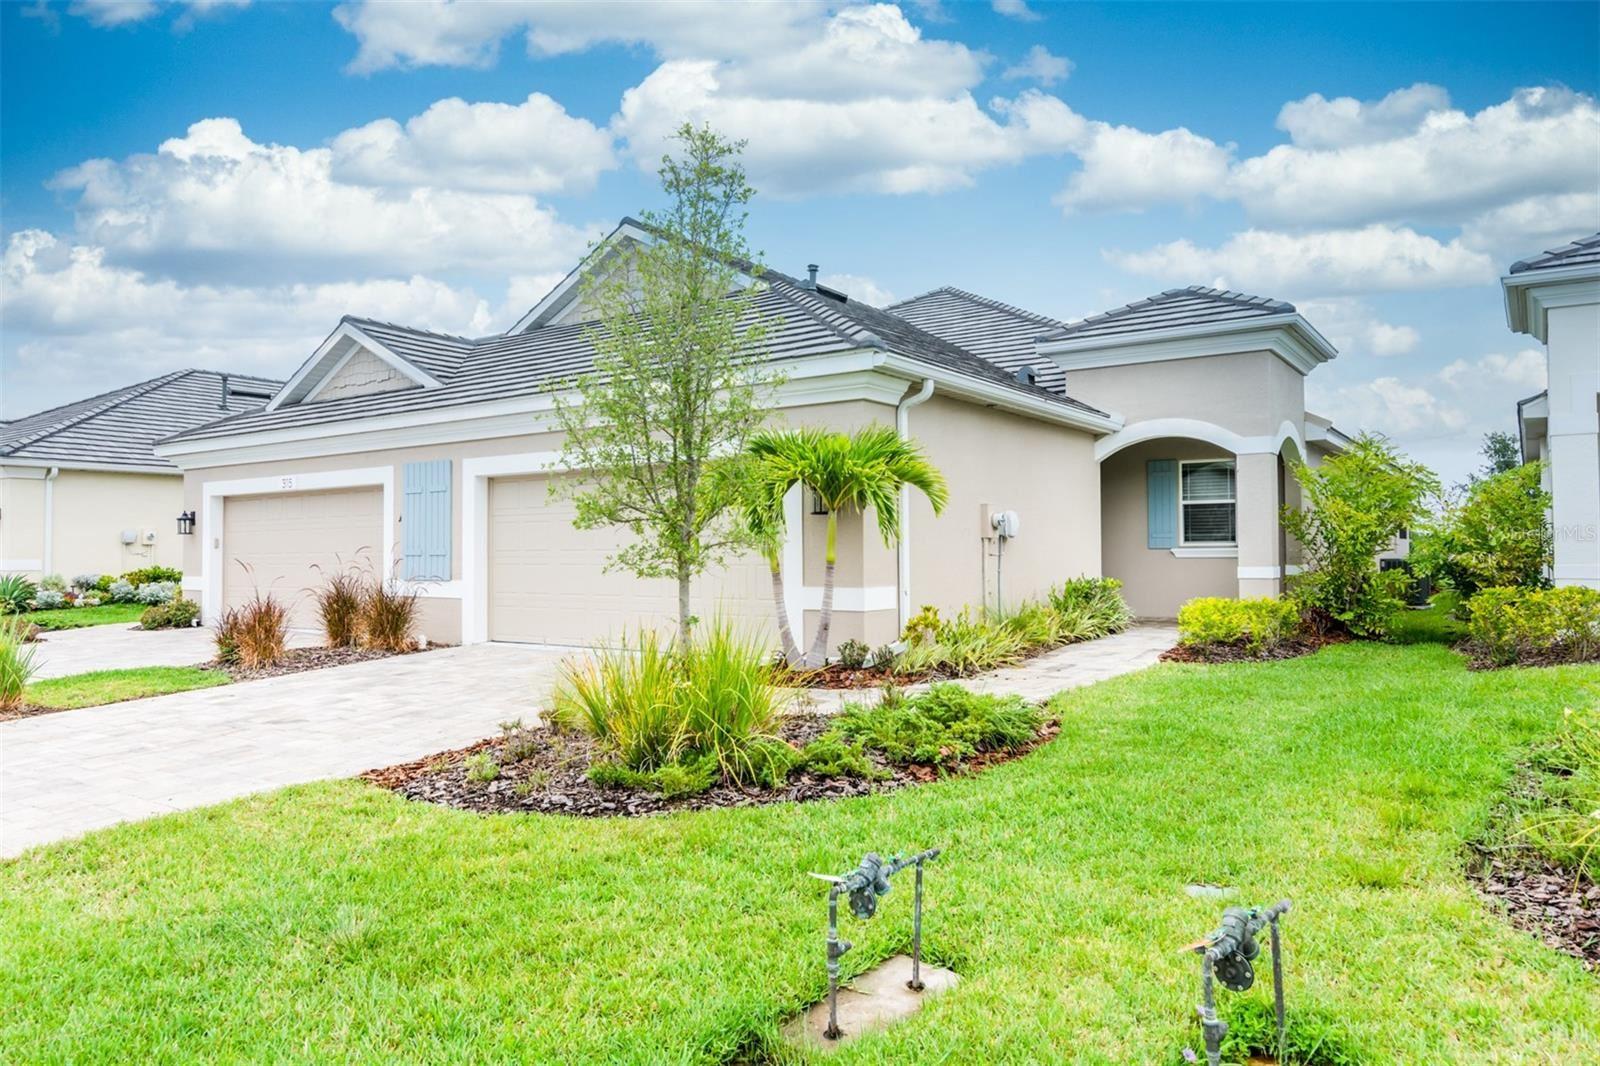 Photo of 3119 TRUSTEE AVENUE, SARASOTA, FL 34243 (MLS # A4504411)